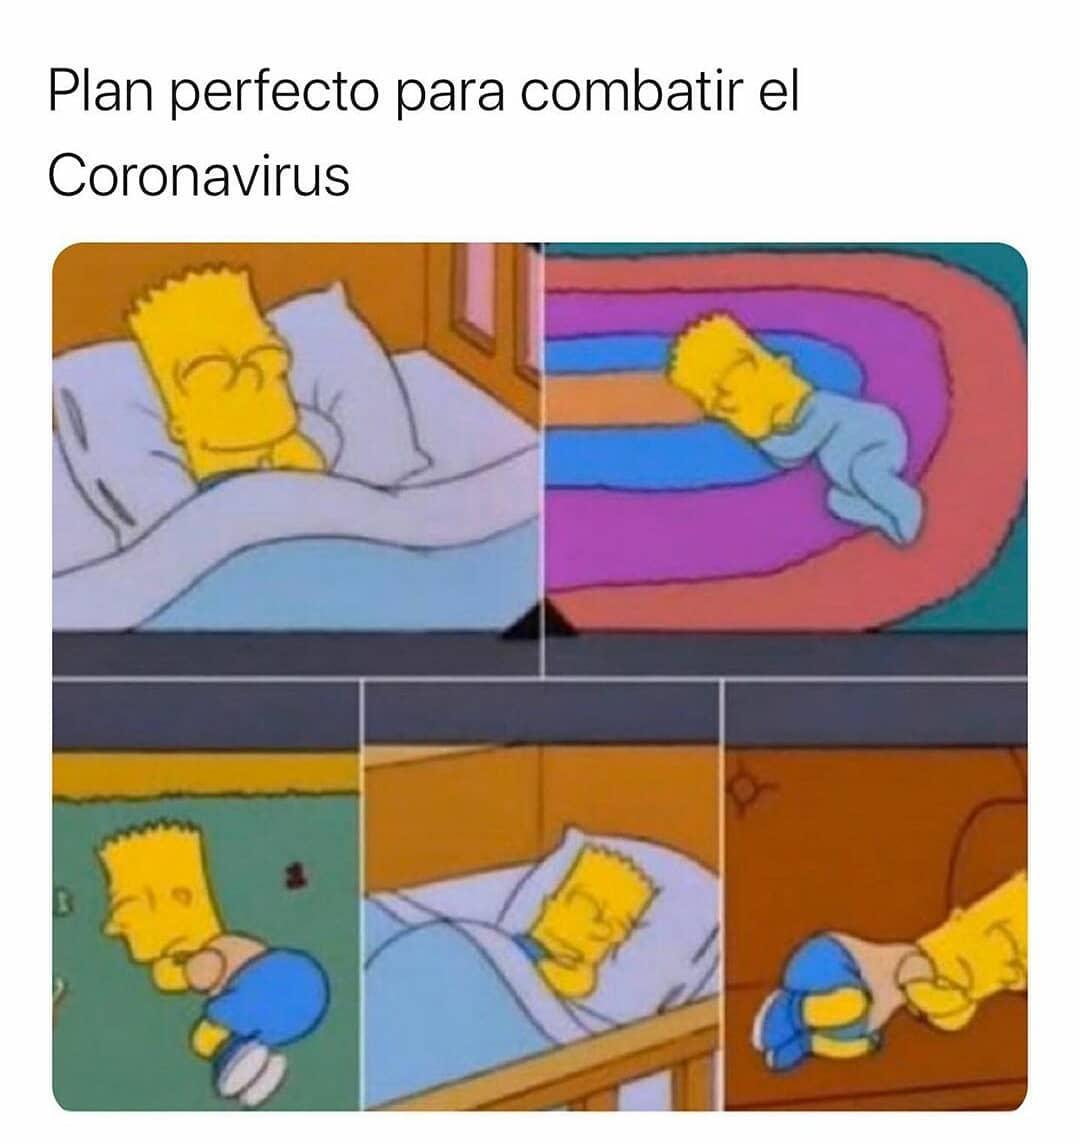 Plan perfecto para combatir el Coronavirus.